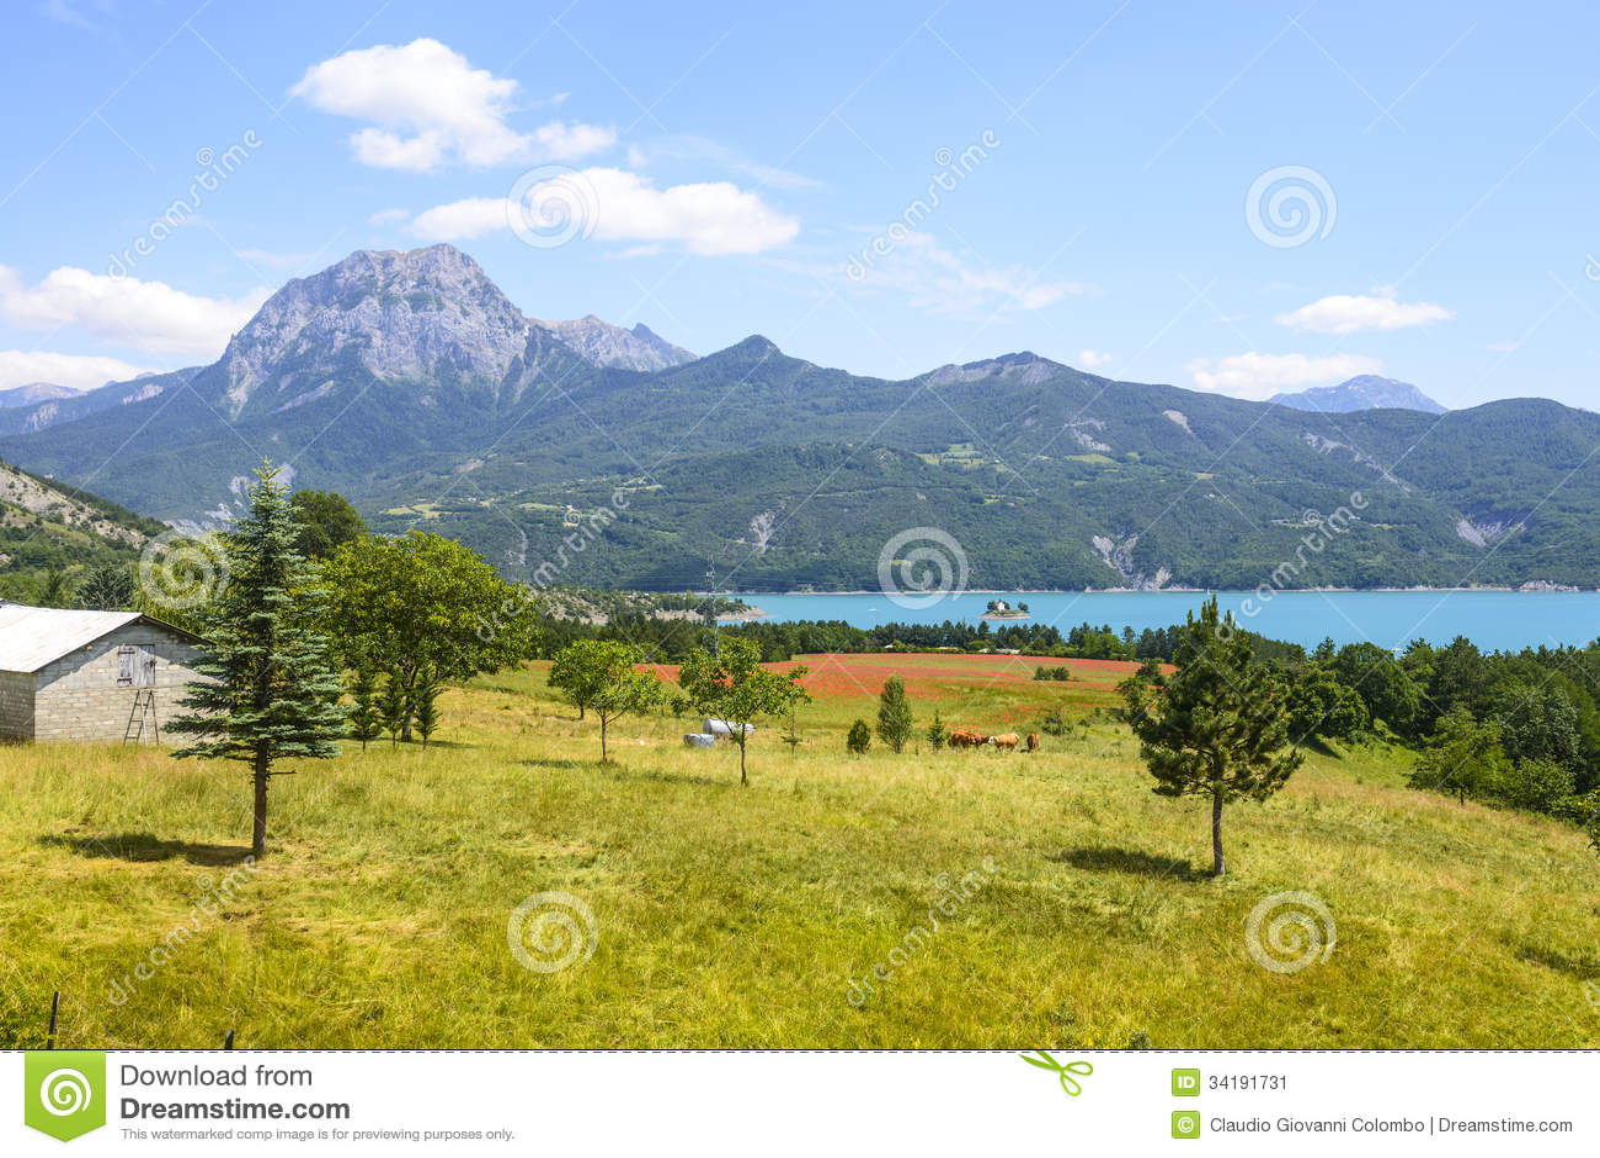 lake of serre poncon french alps stock image image. Black Bedroom Furniture Sets. Home Design Ideas